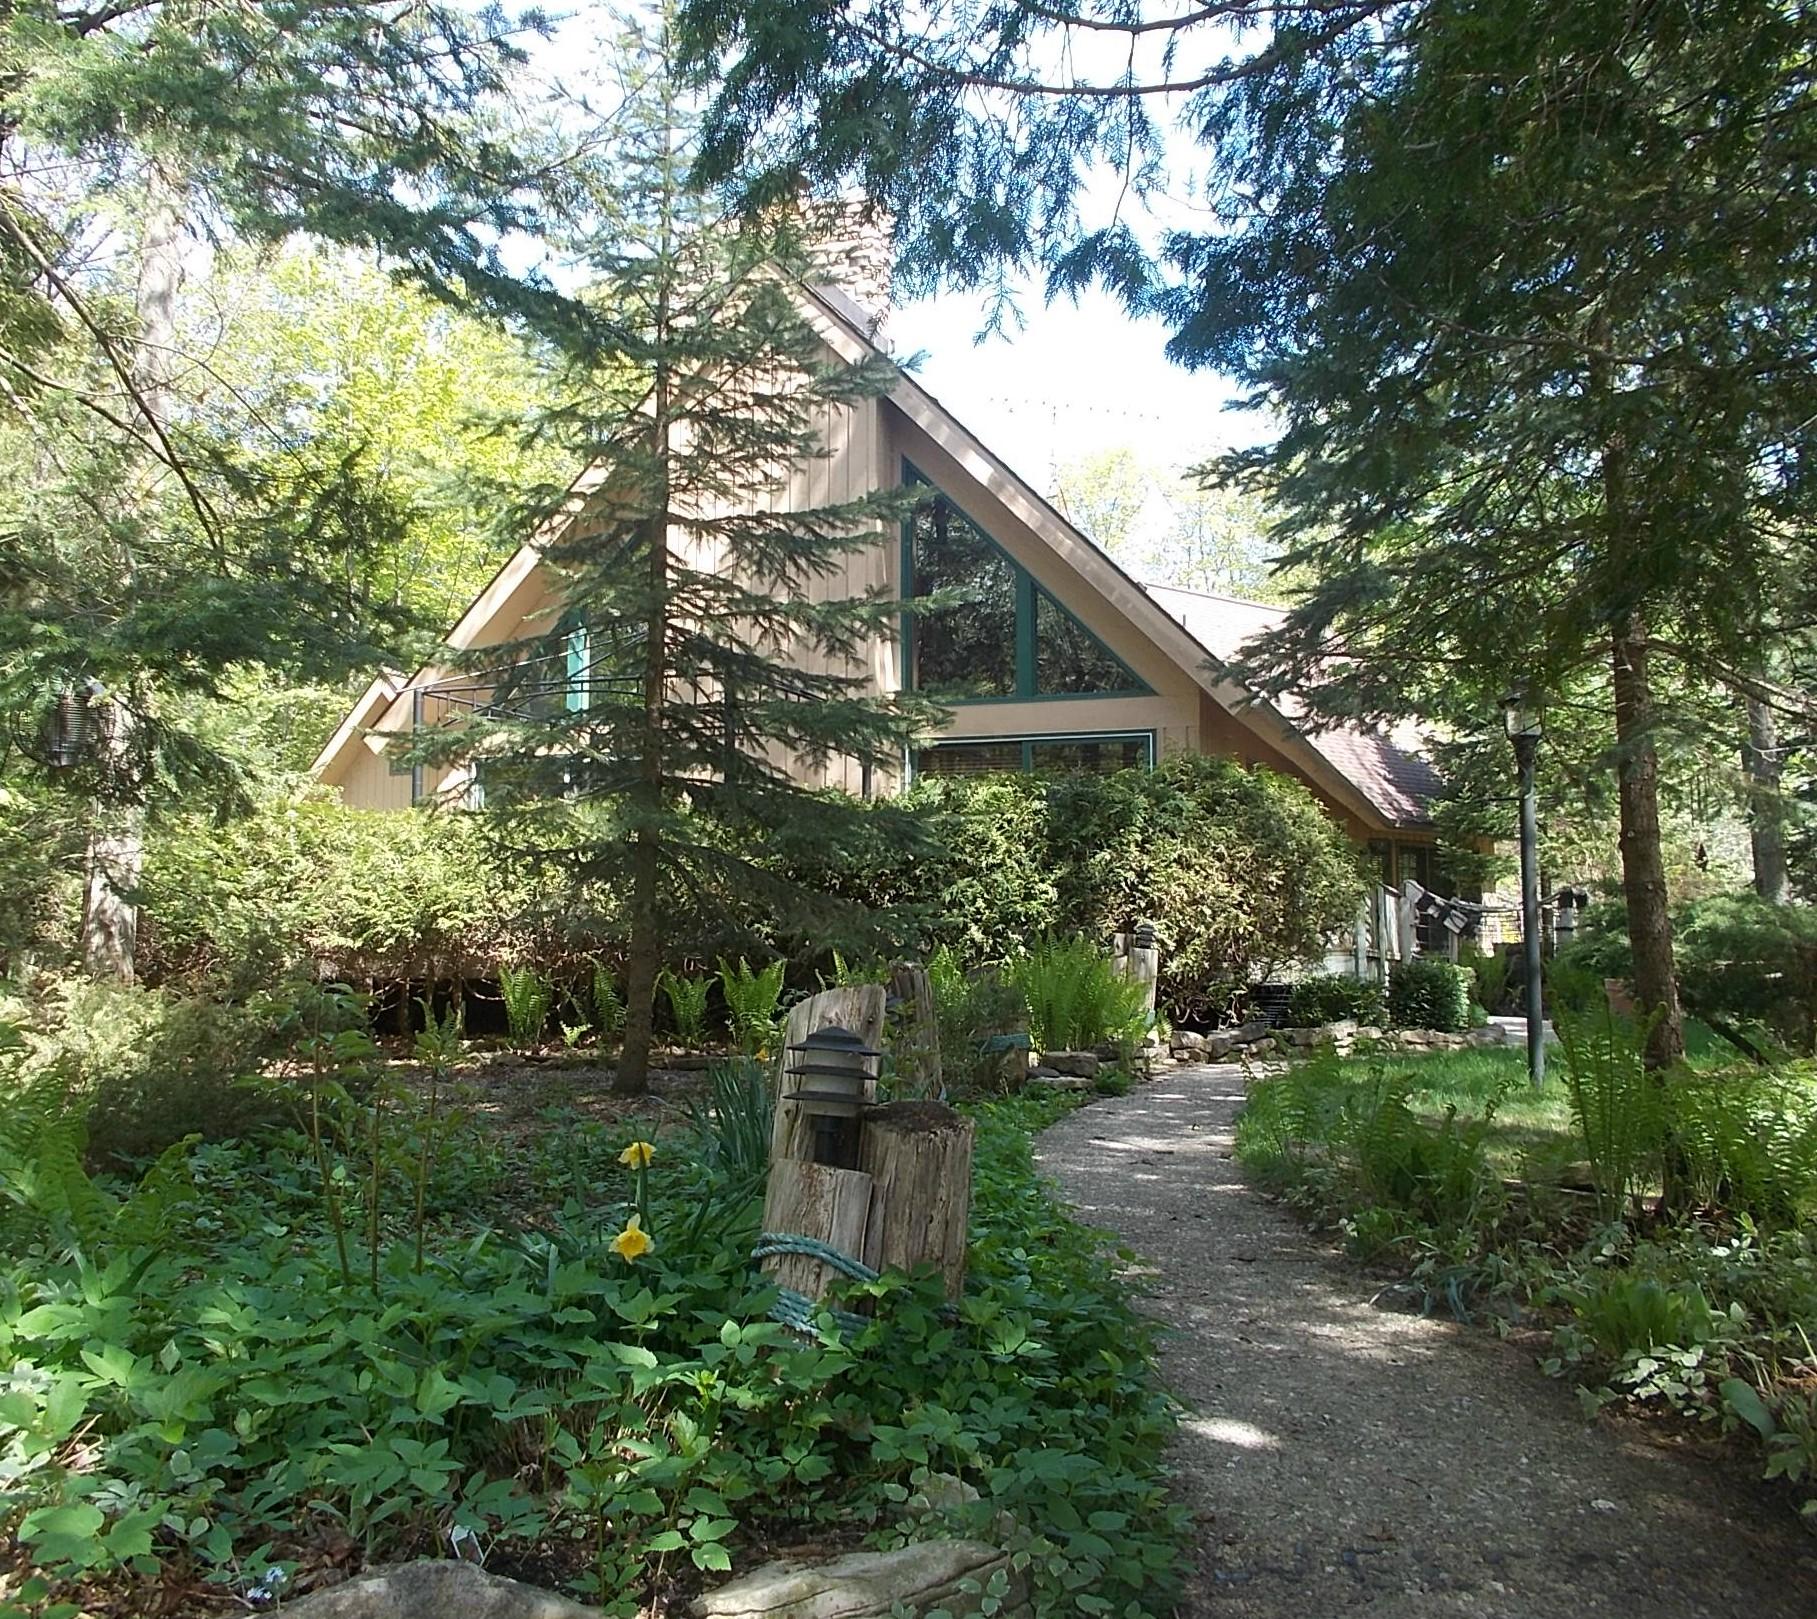 Four Bedroom Homes for Sale in Door County WI